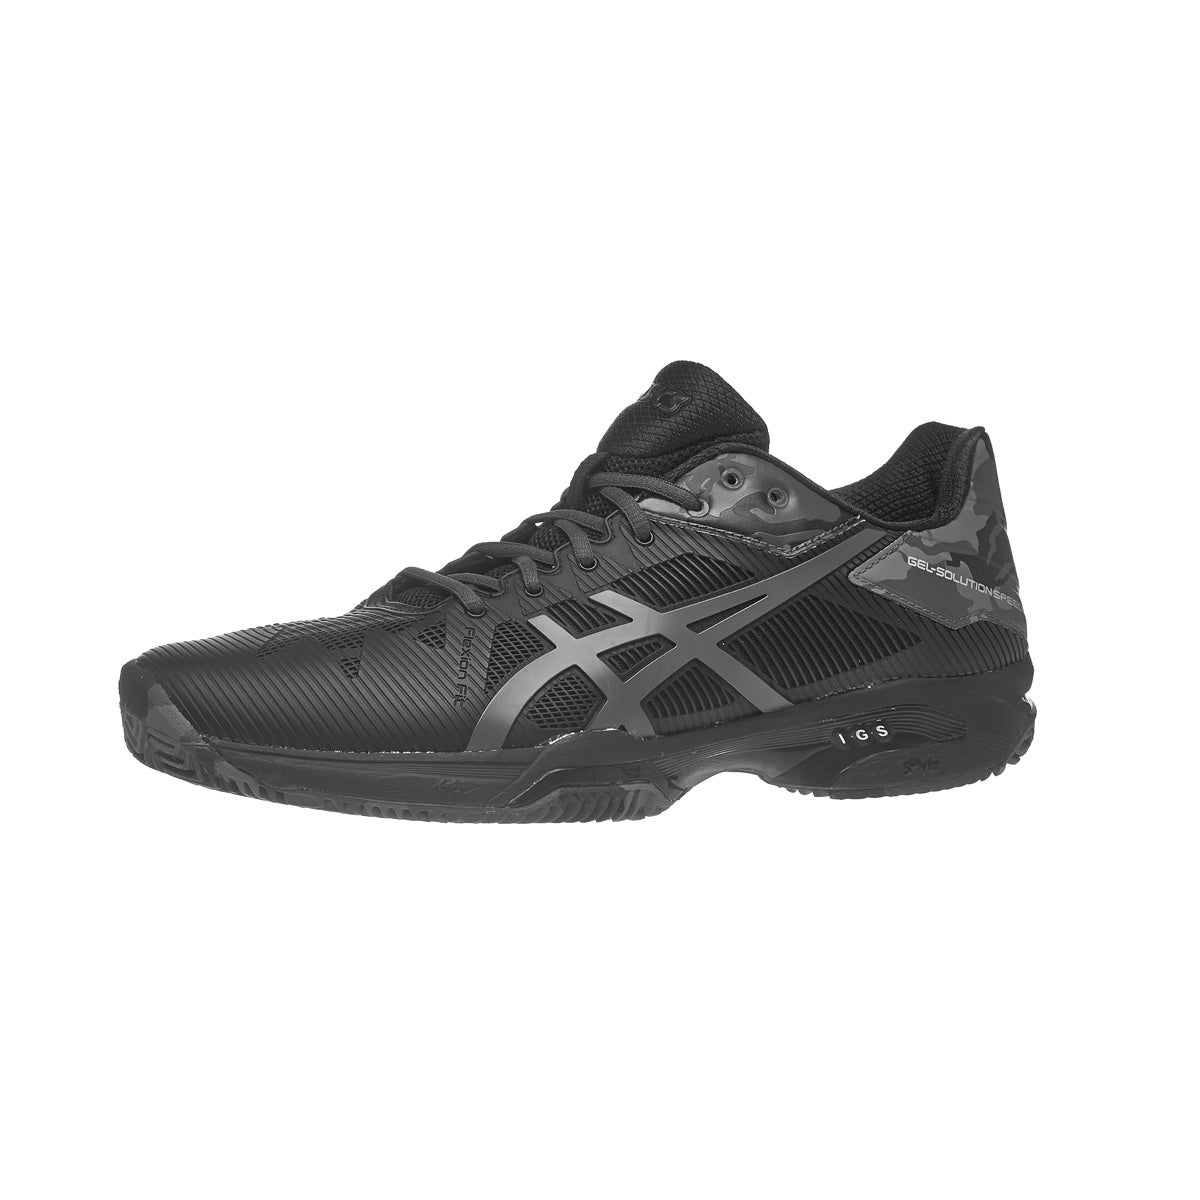 Chaussures Hommes Asics Gel Solution Speed ° Gel 3 Argile Camo Speed Vue 360 ° 7f0d3a0 - trumpfacts.website